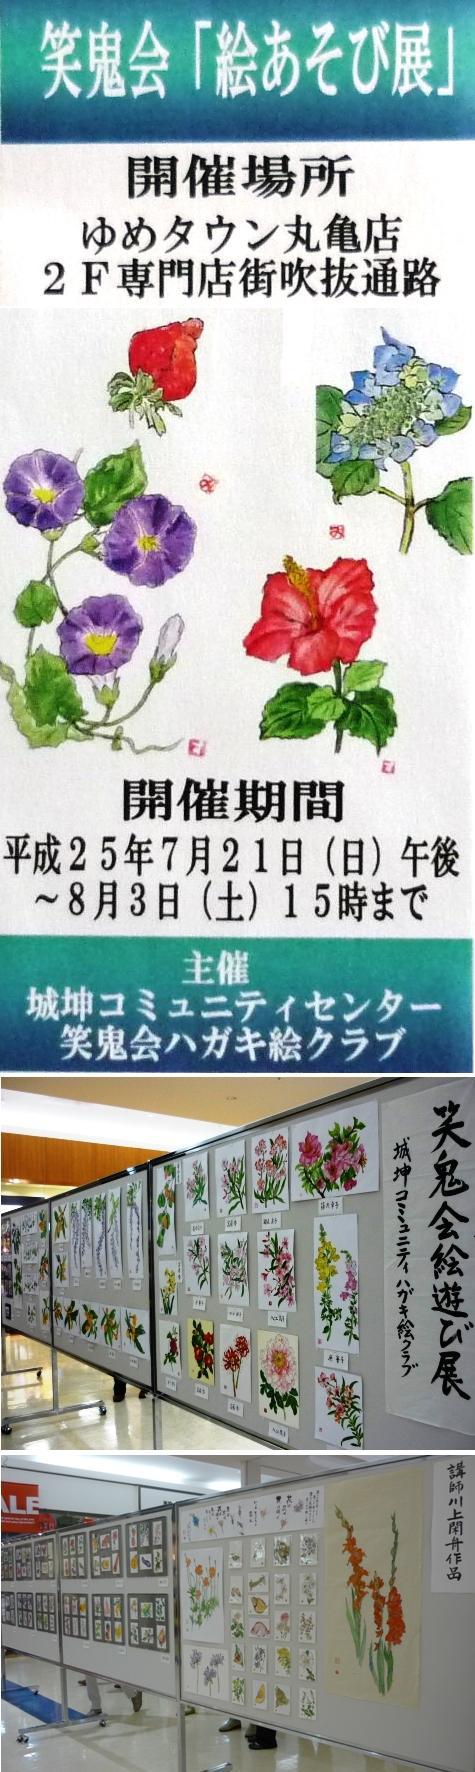 a絵あそび展P1250219